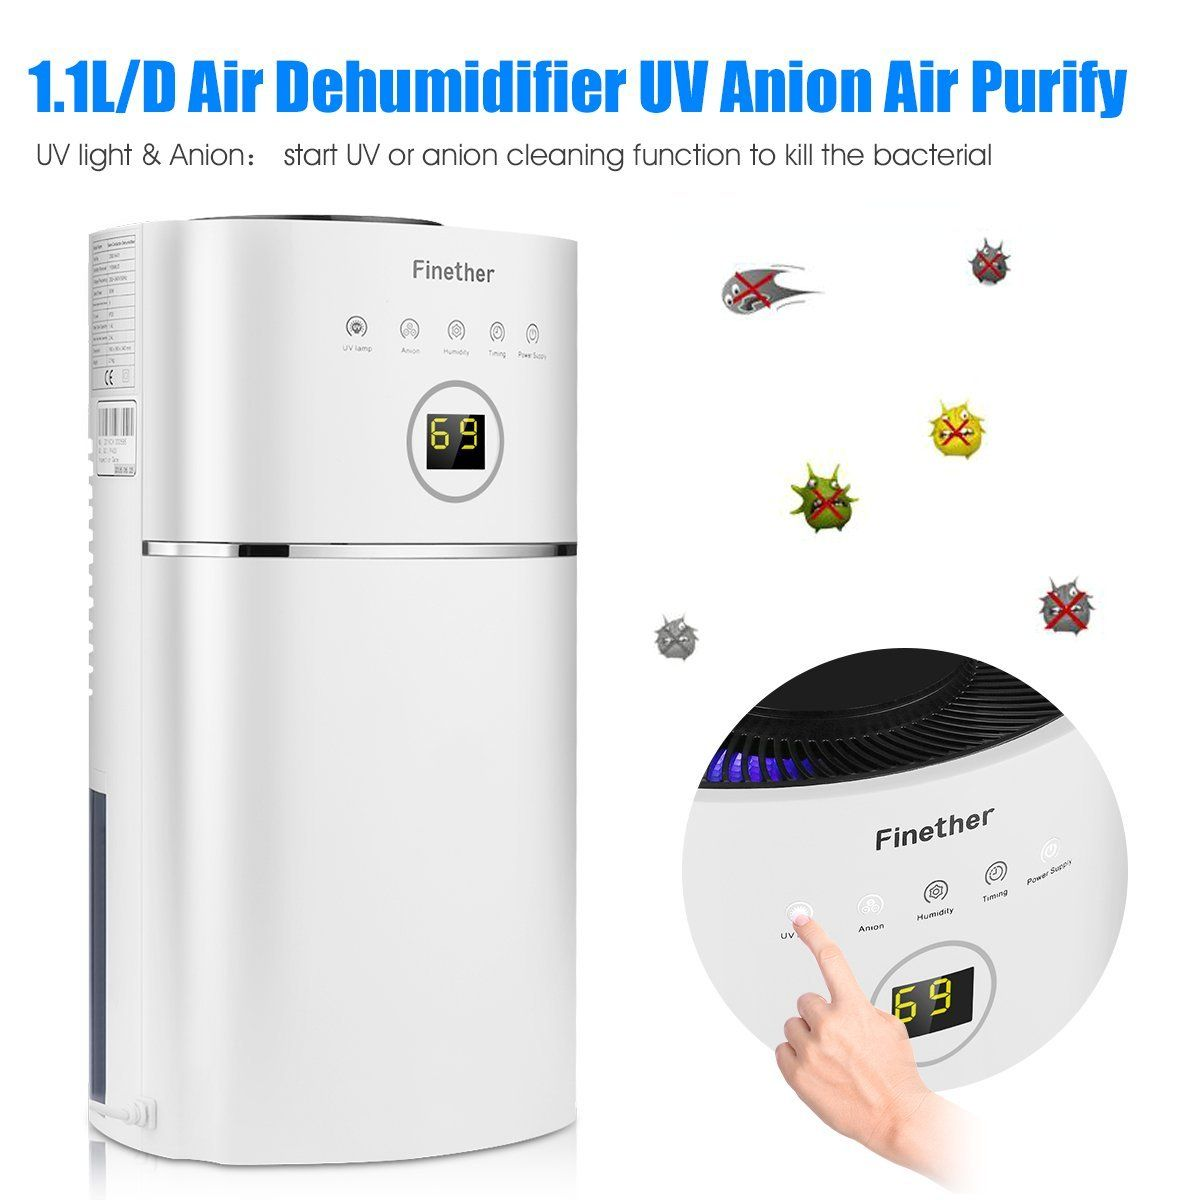 Finether 1.1L/D Digital Air Dehumidifier Anion UV Air Purify Portable  Lightweight Low Energy